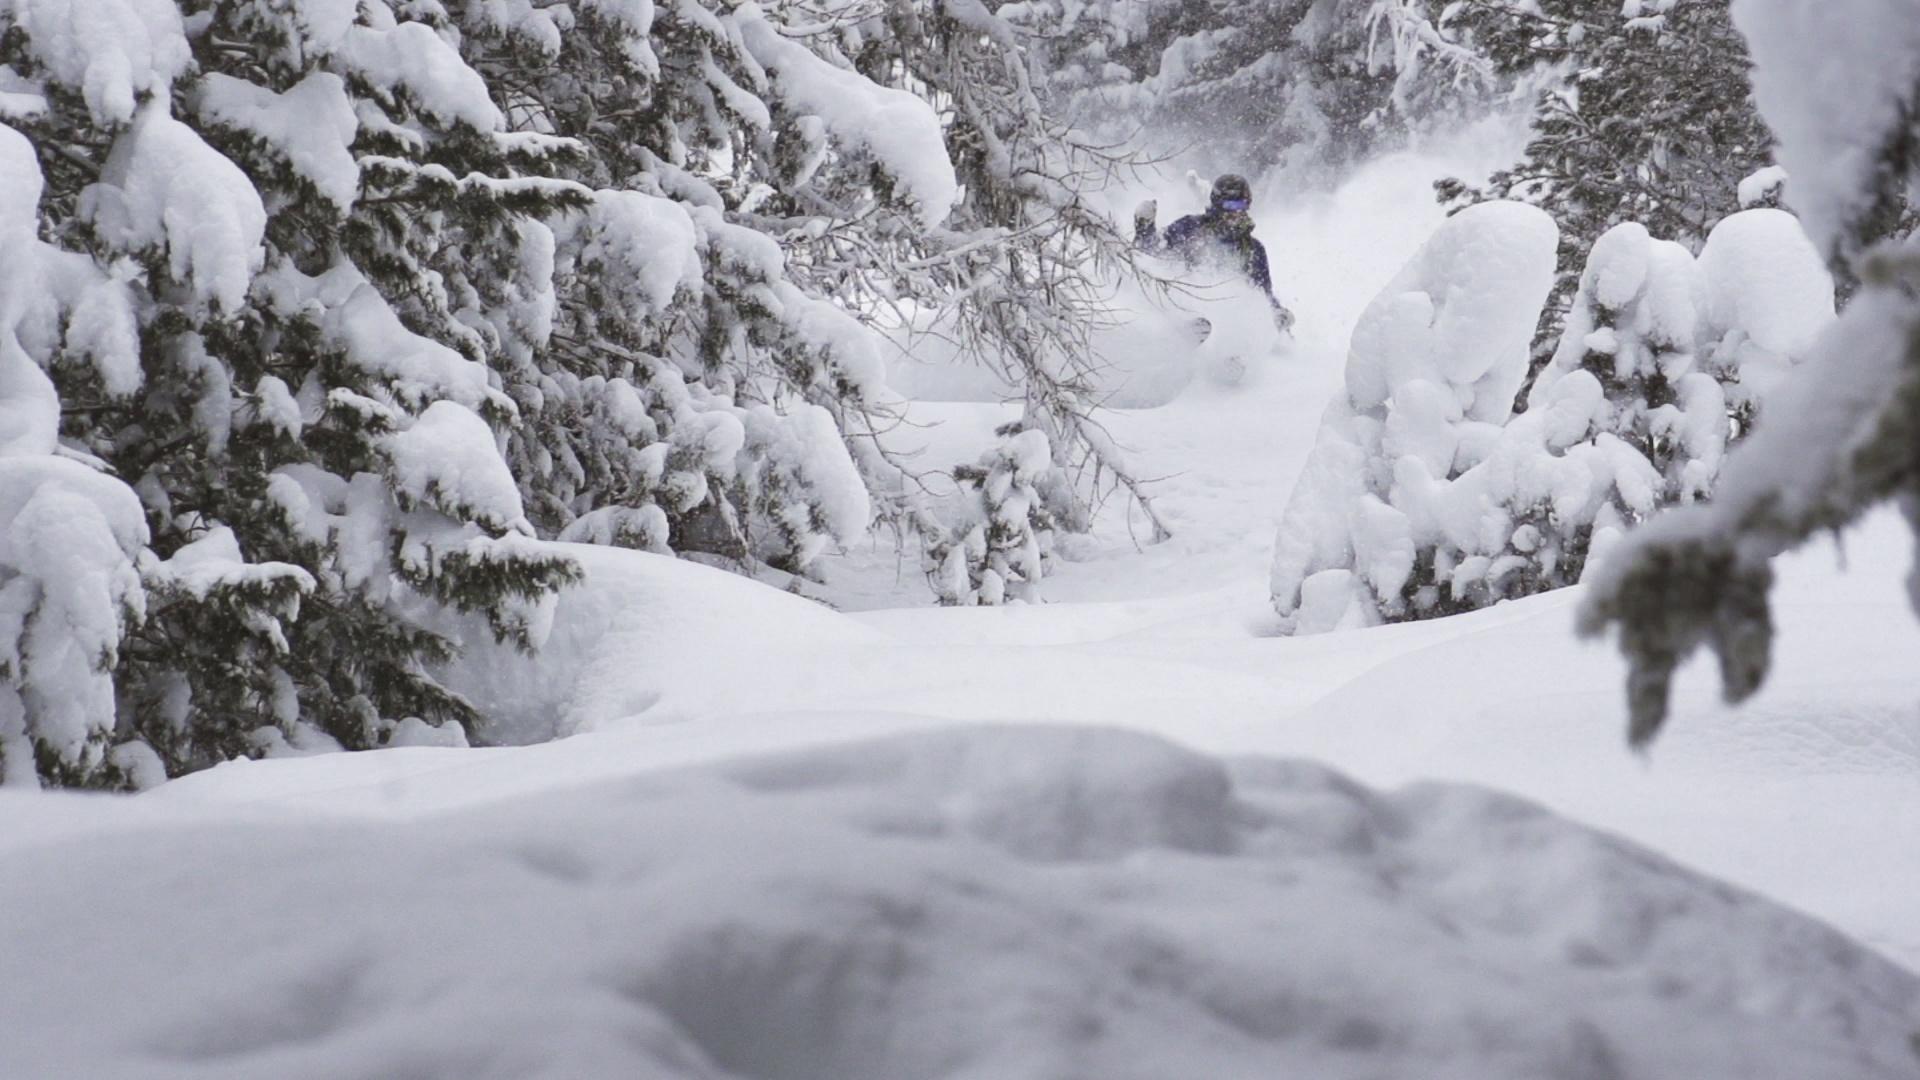 Die 3 besten Freeride-Spots in den Alpen